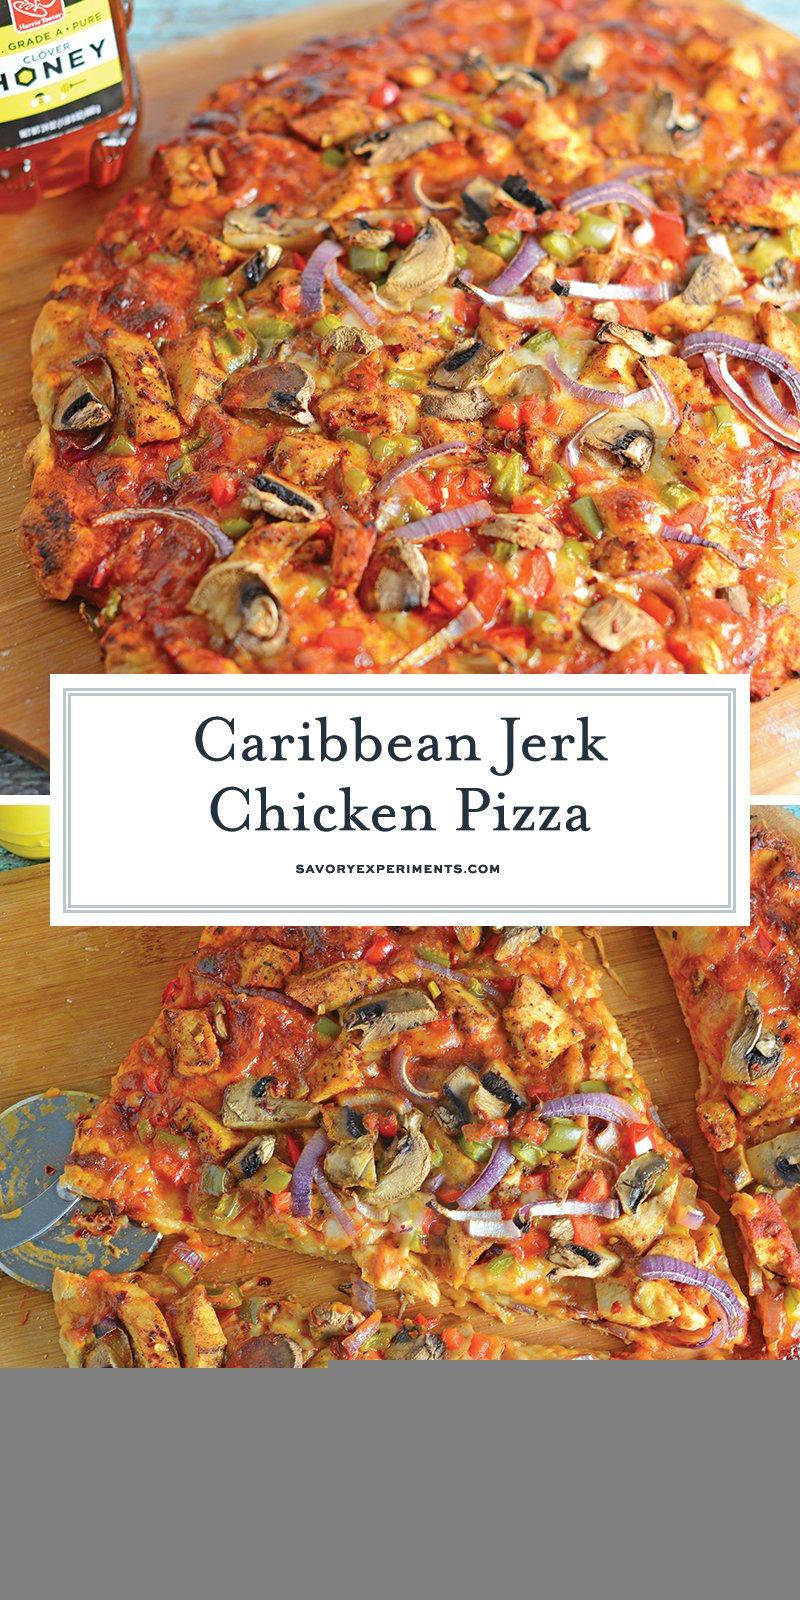 Caribbean Jerk Chicken Pizza is an easy homemade pizza recipe using spicy chicken, fresh vegetables and a touch of honey.#homemadepizza #jerkchicken #jerkchickenpizza www.savoryexperiments.com